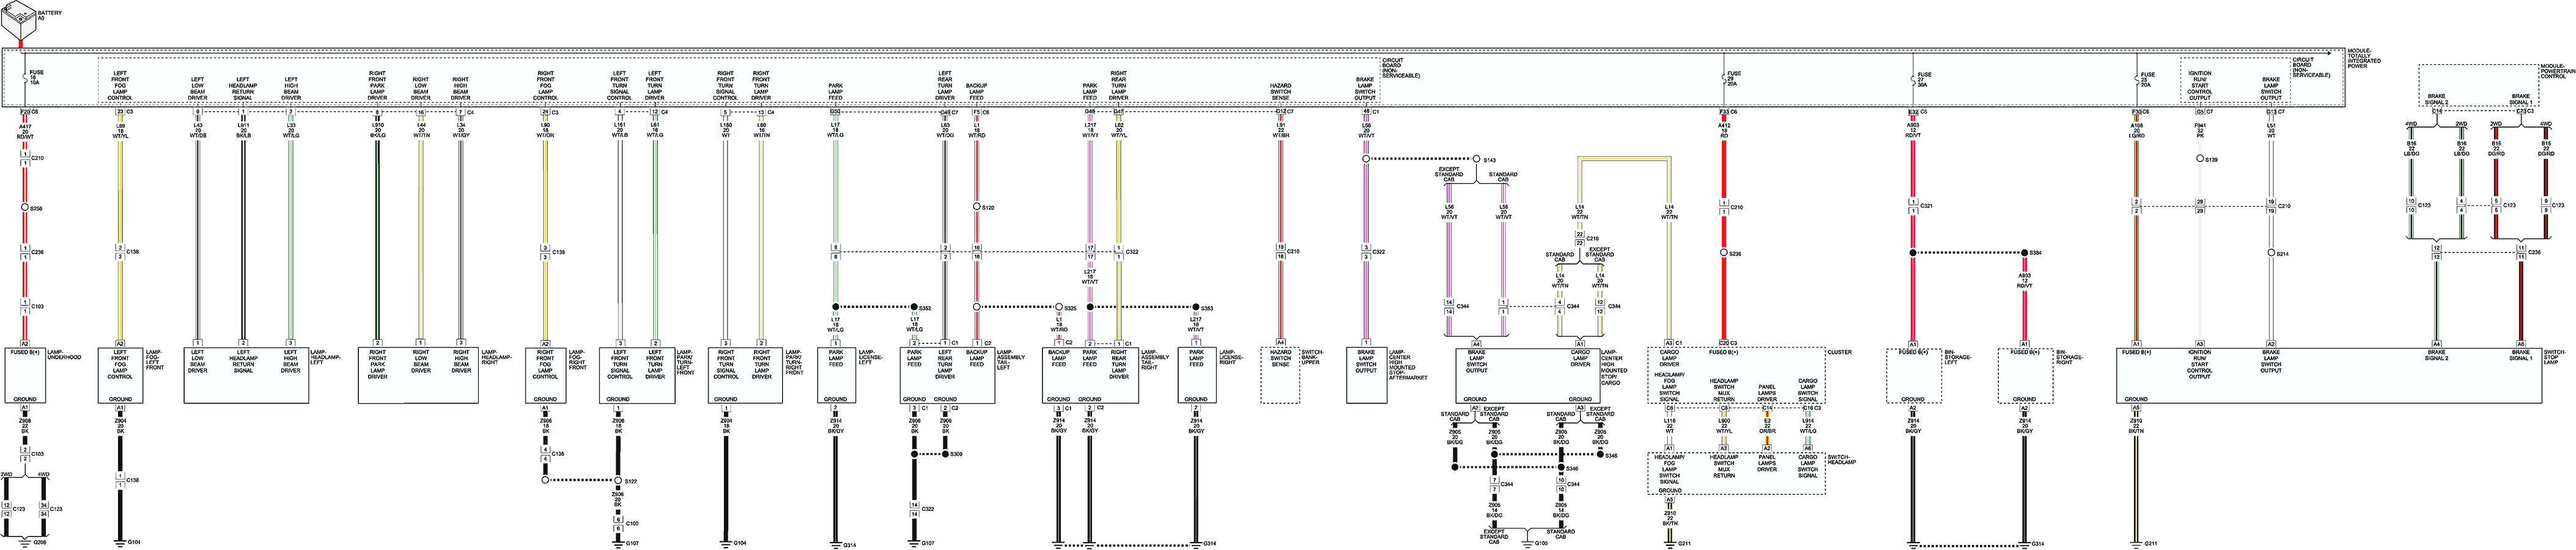 5d20dc5b-92f2-4b4c-9dec-2be4d4139807_headlight circuit.png